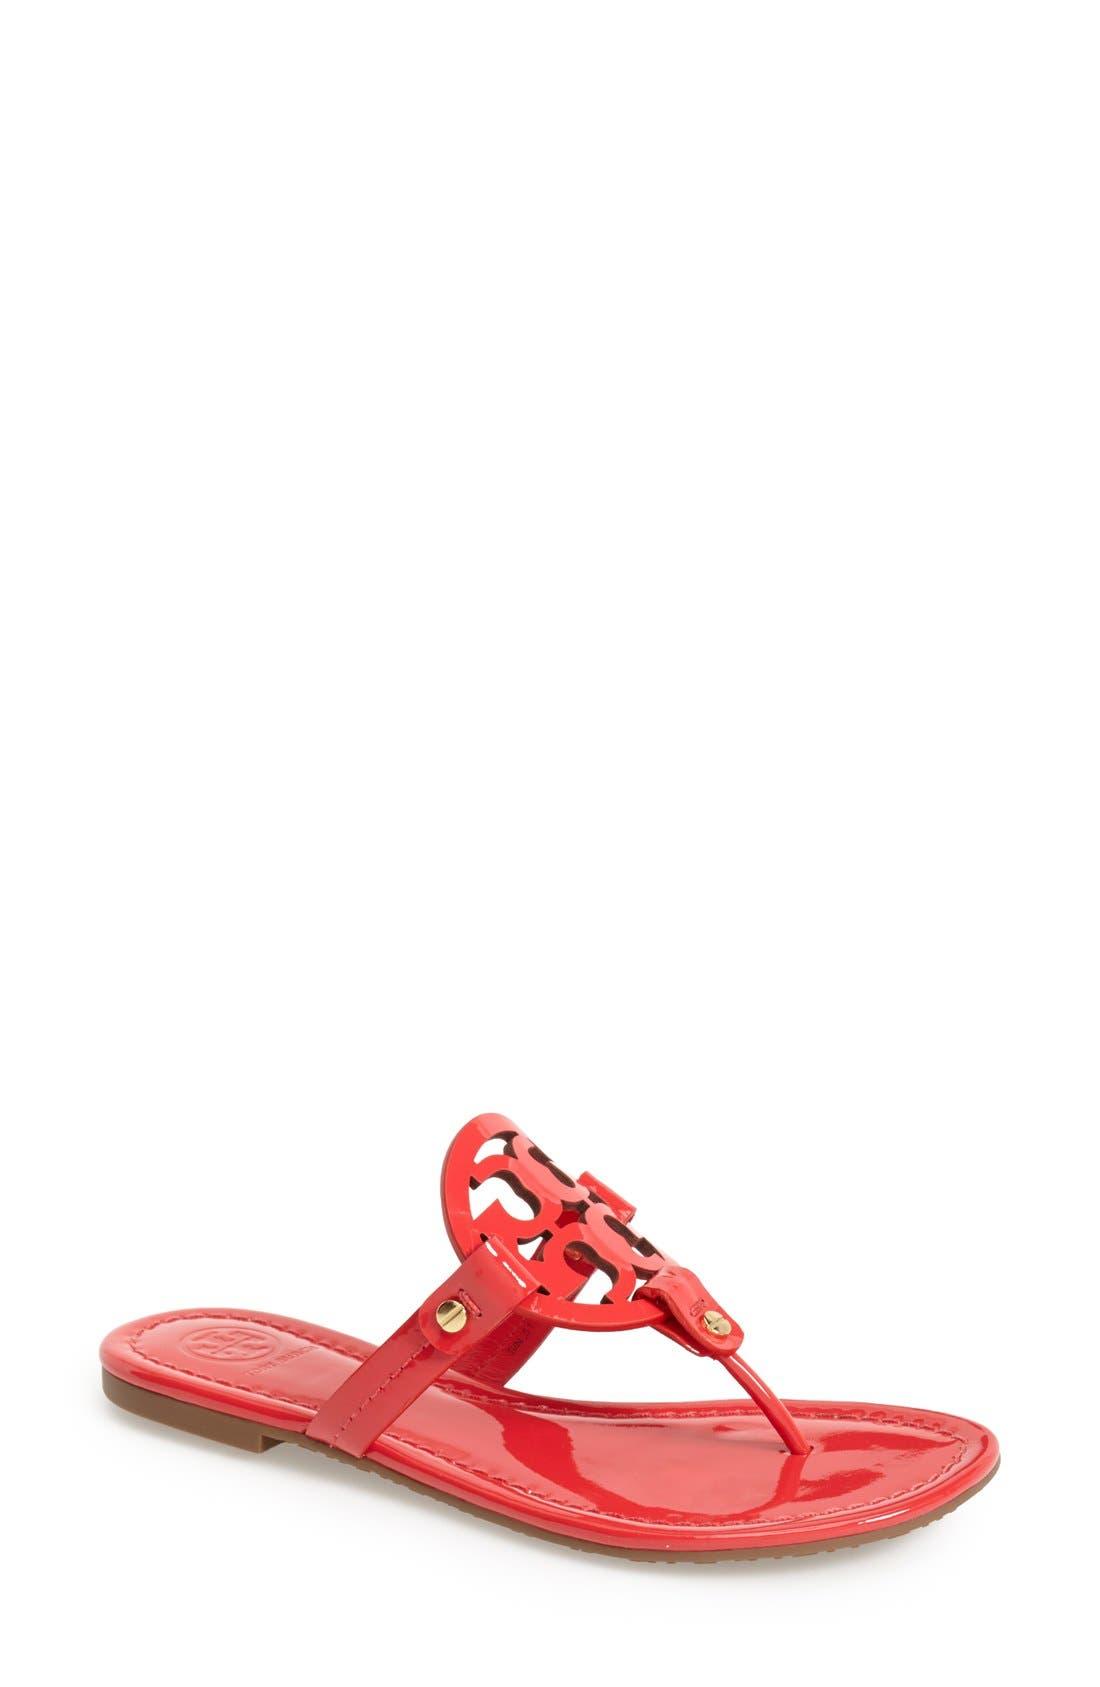 Alternate Image 1 Selected - Tory Burch 'Miller' Sandal (Women) (Nordstrom Exclusive)